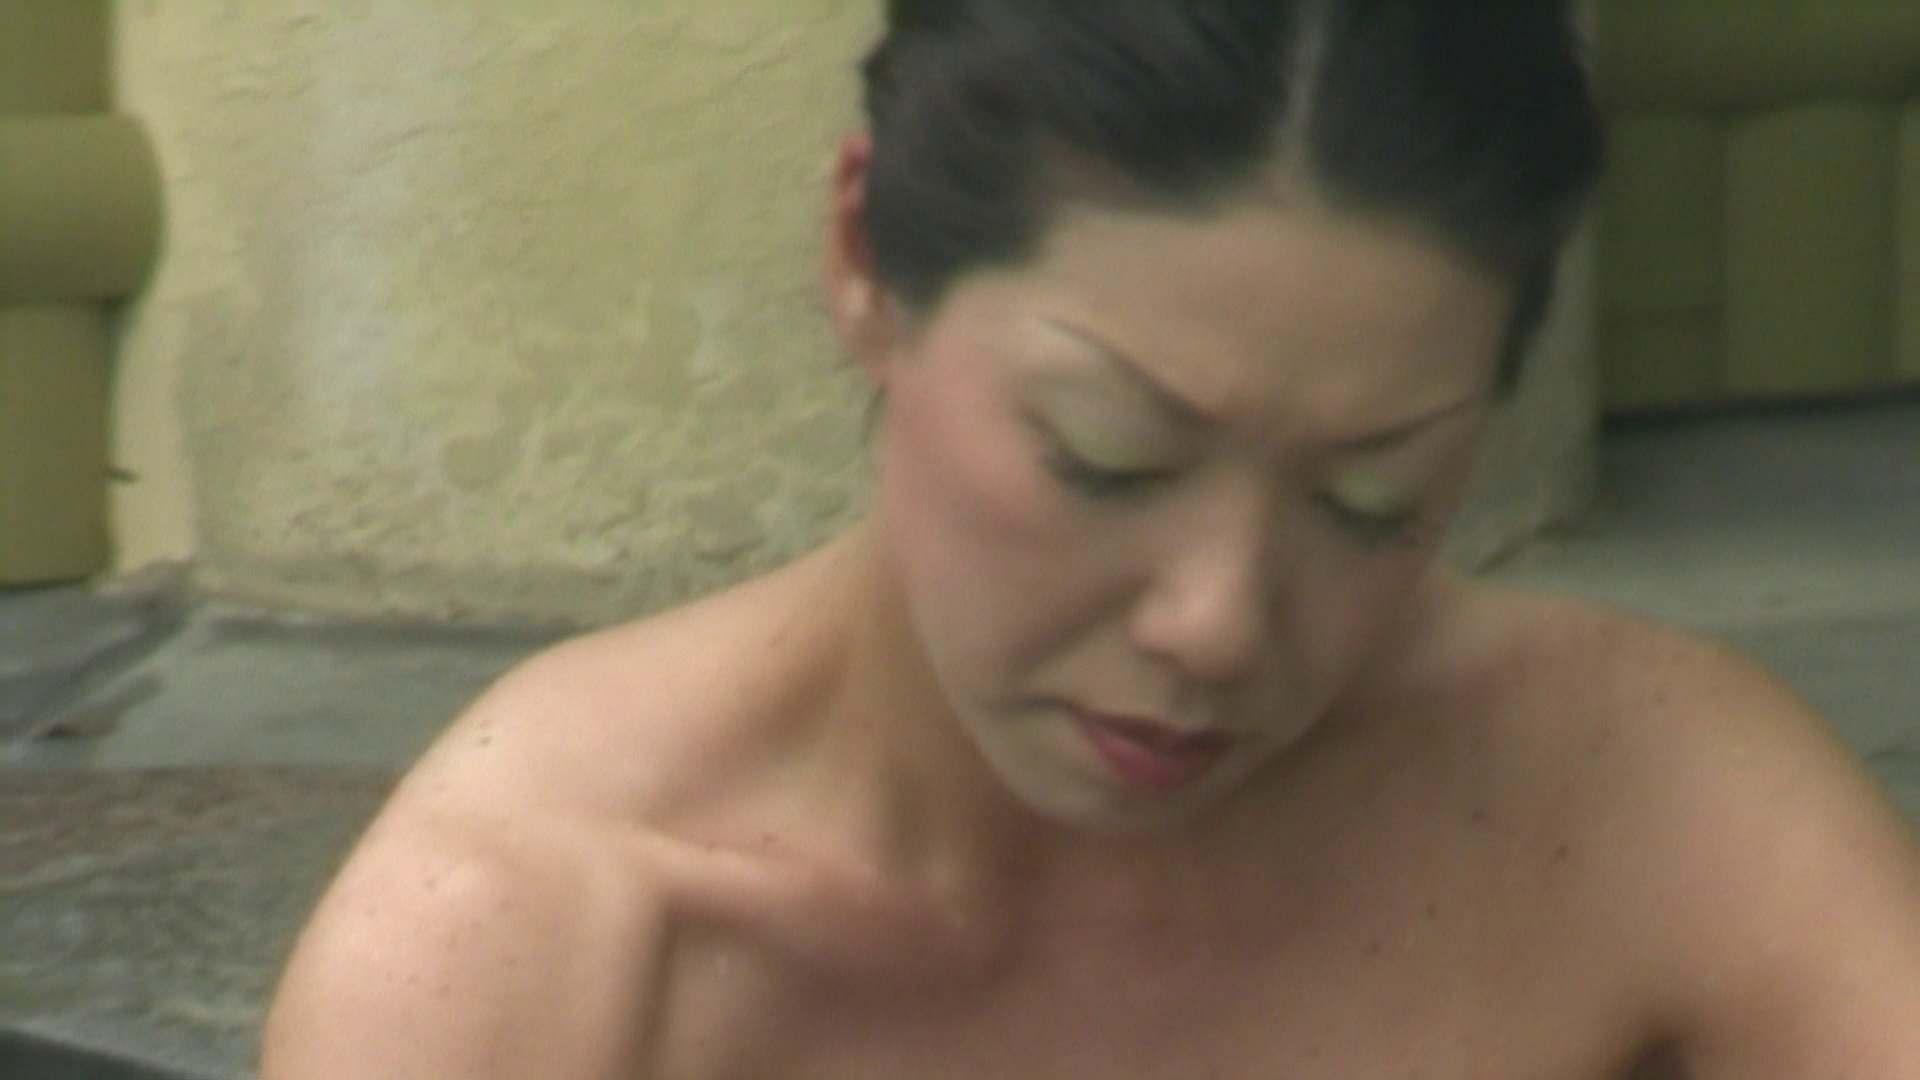 高画質露天女風呂観察 vol.036 OLセックス | 乙女  96画像 22